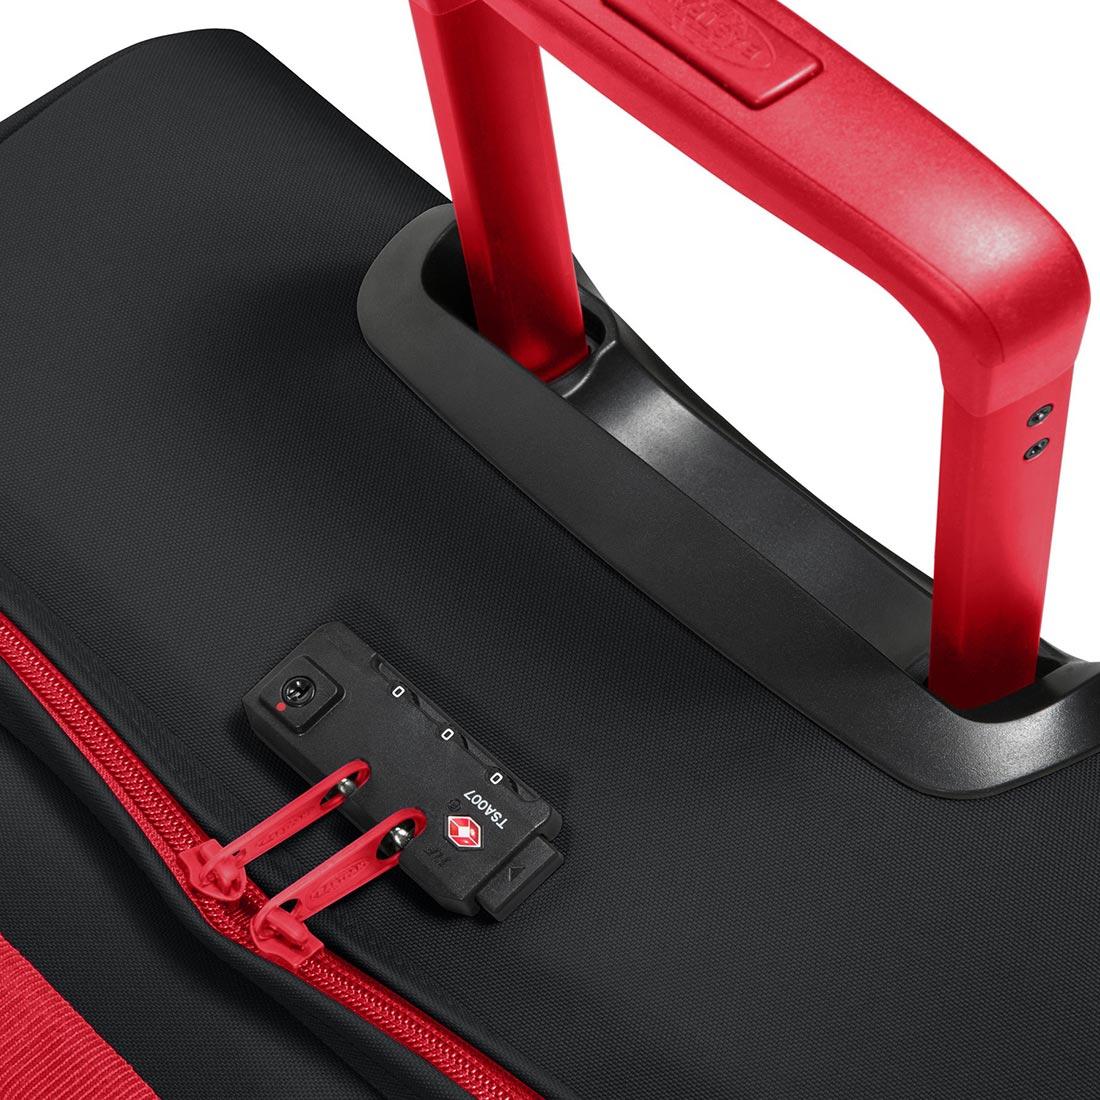 Eastpak Tranverz S 42L Carry On Suitcase - Blakout Dark